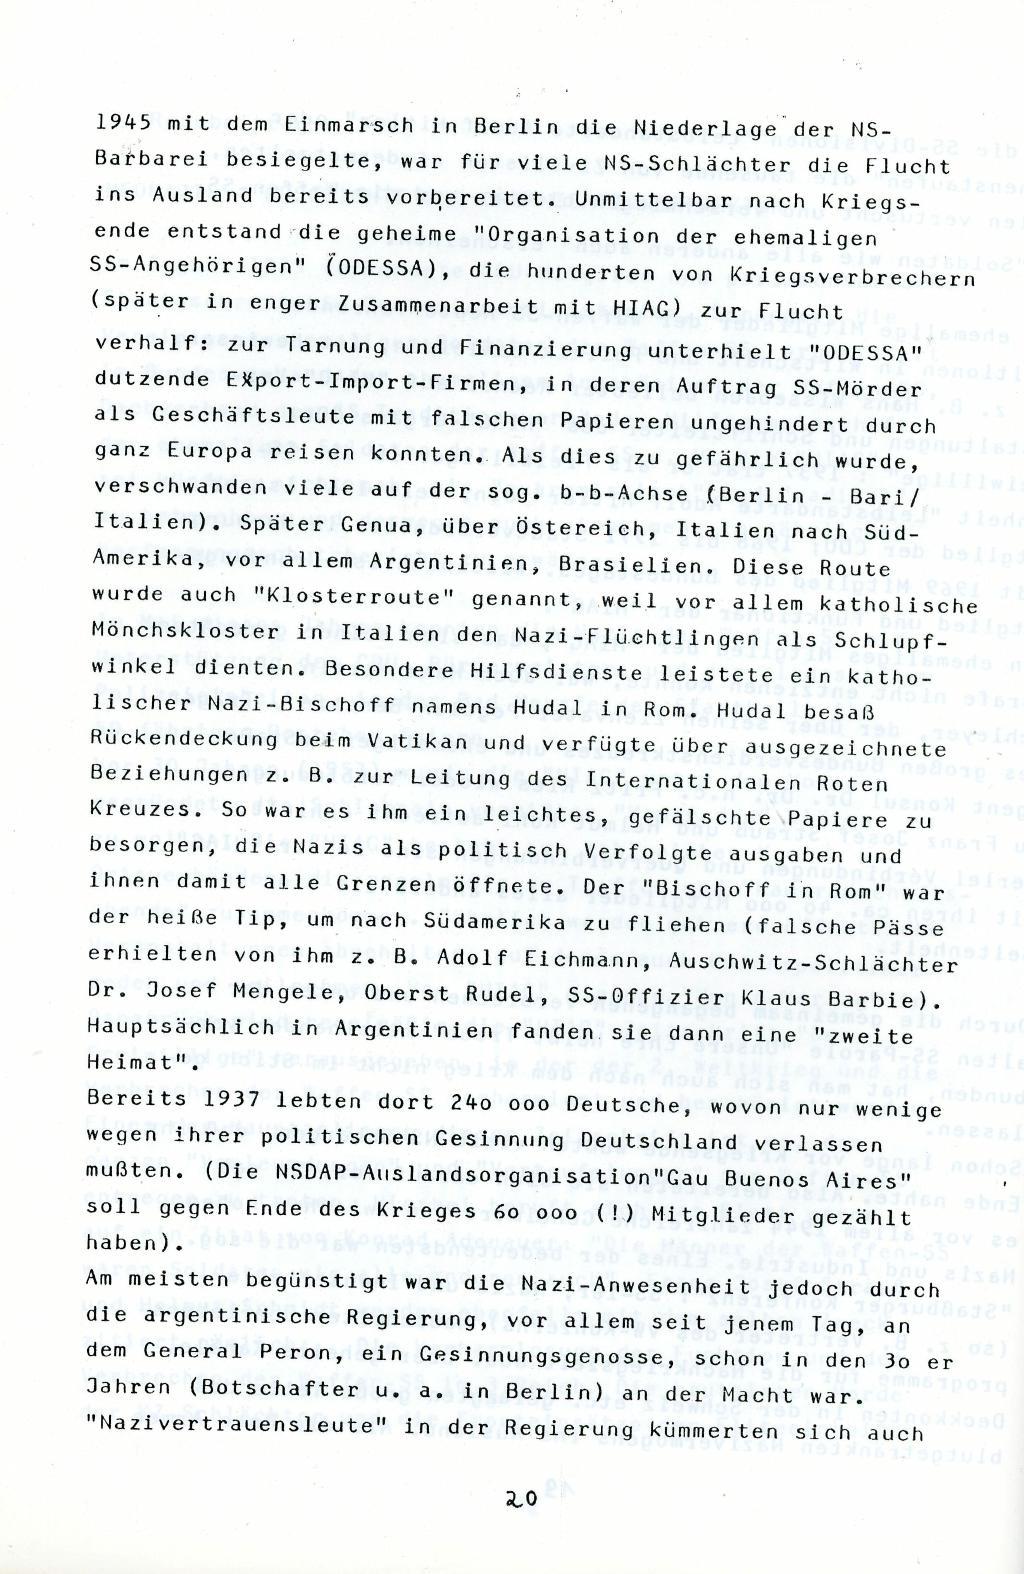 Berlin_1983_Autonome_Gruppen_Faschismus_im_Kapitalismus_20